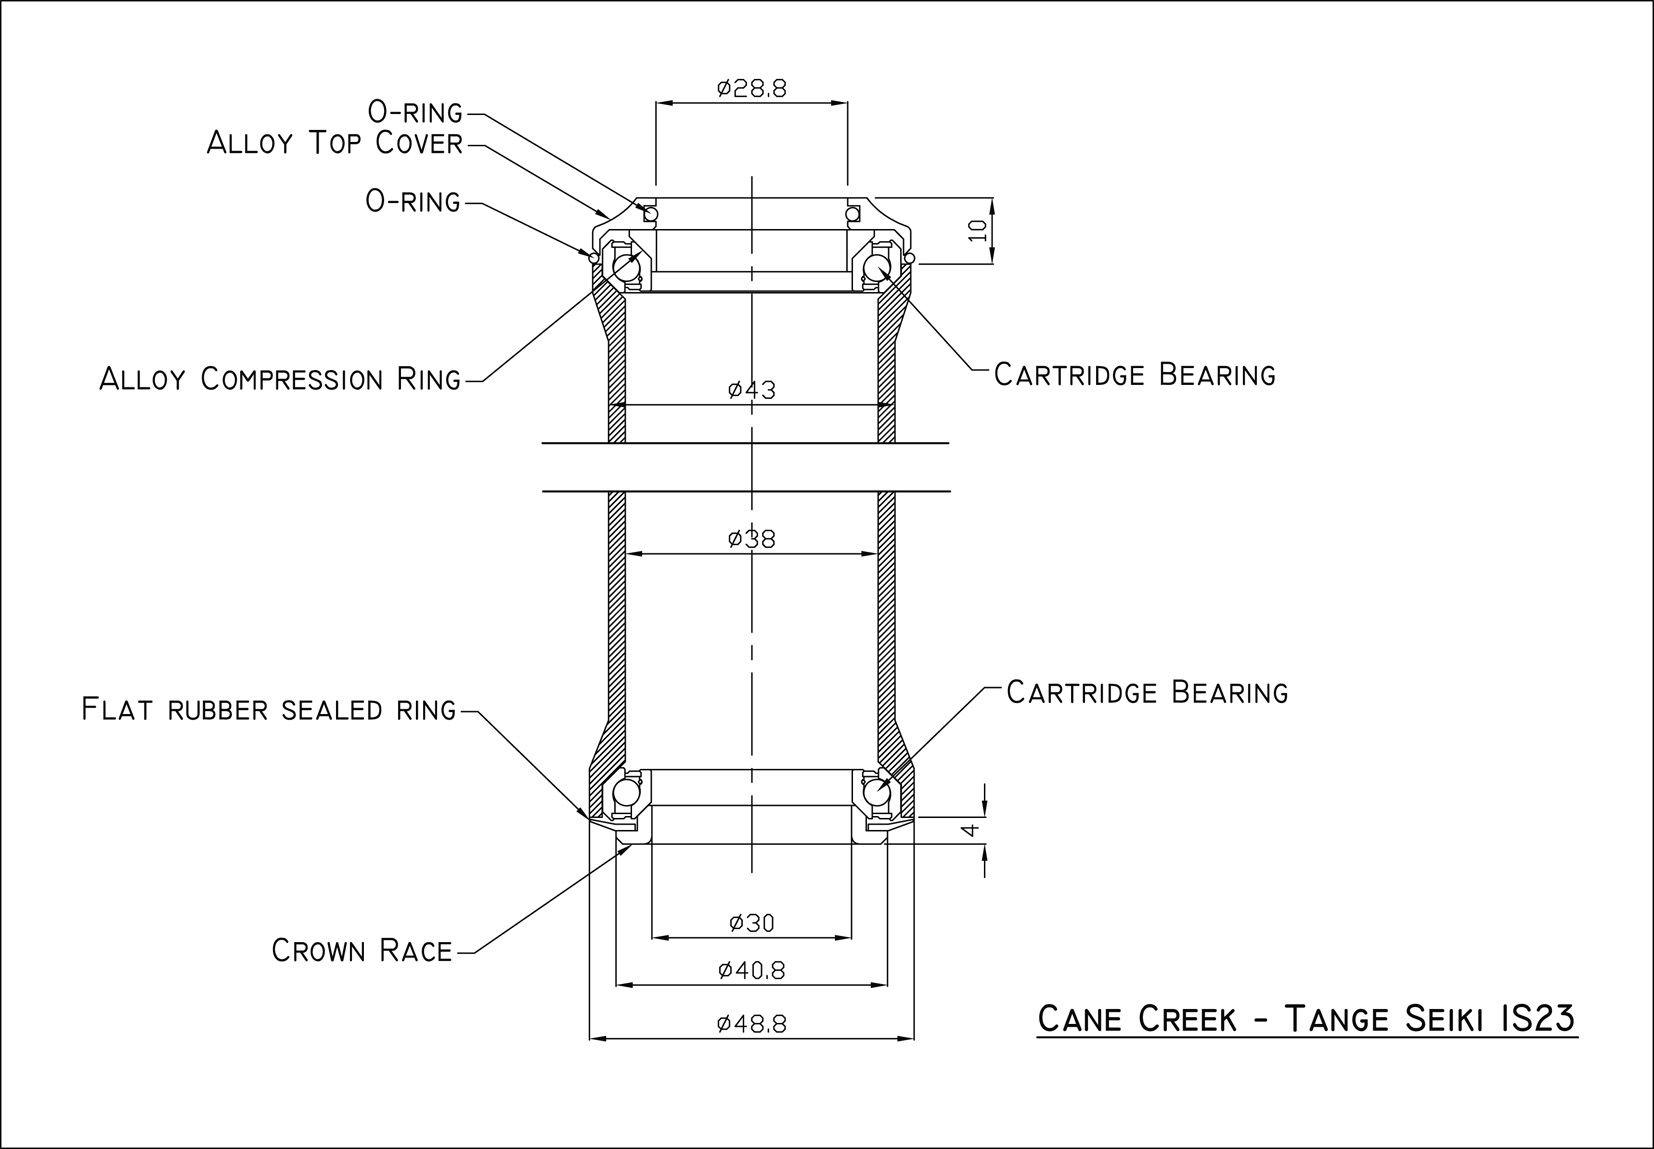 aheadset install diagram cane creek tange seiki icbm headset is23 aheadset aheadset diagram